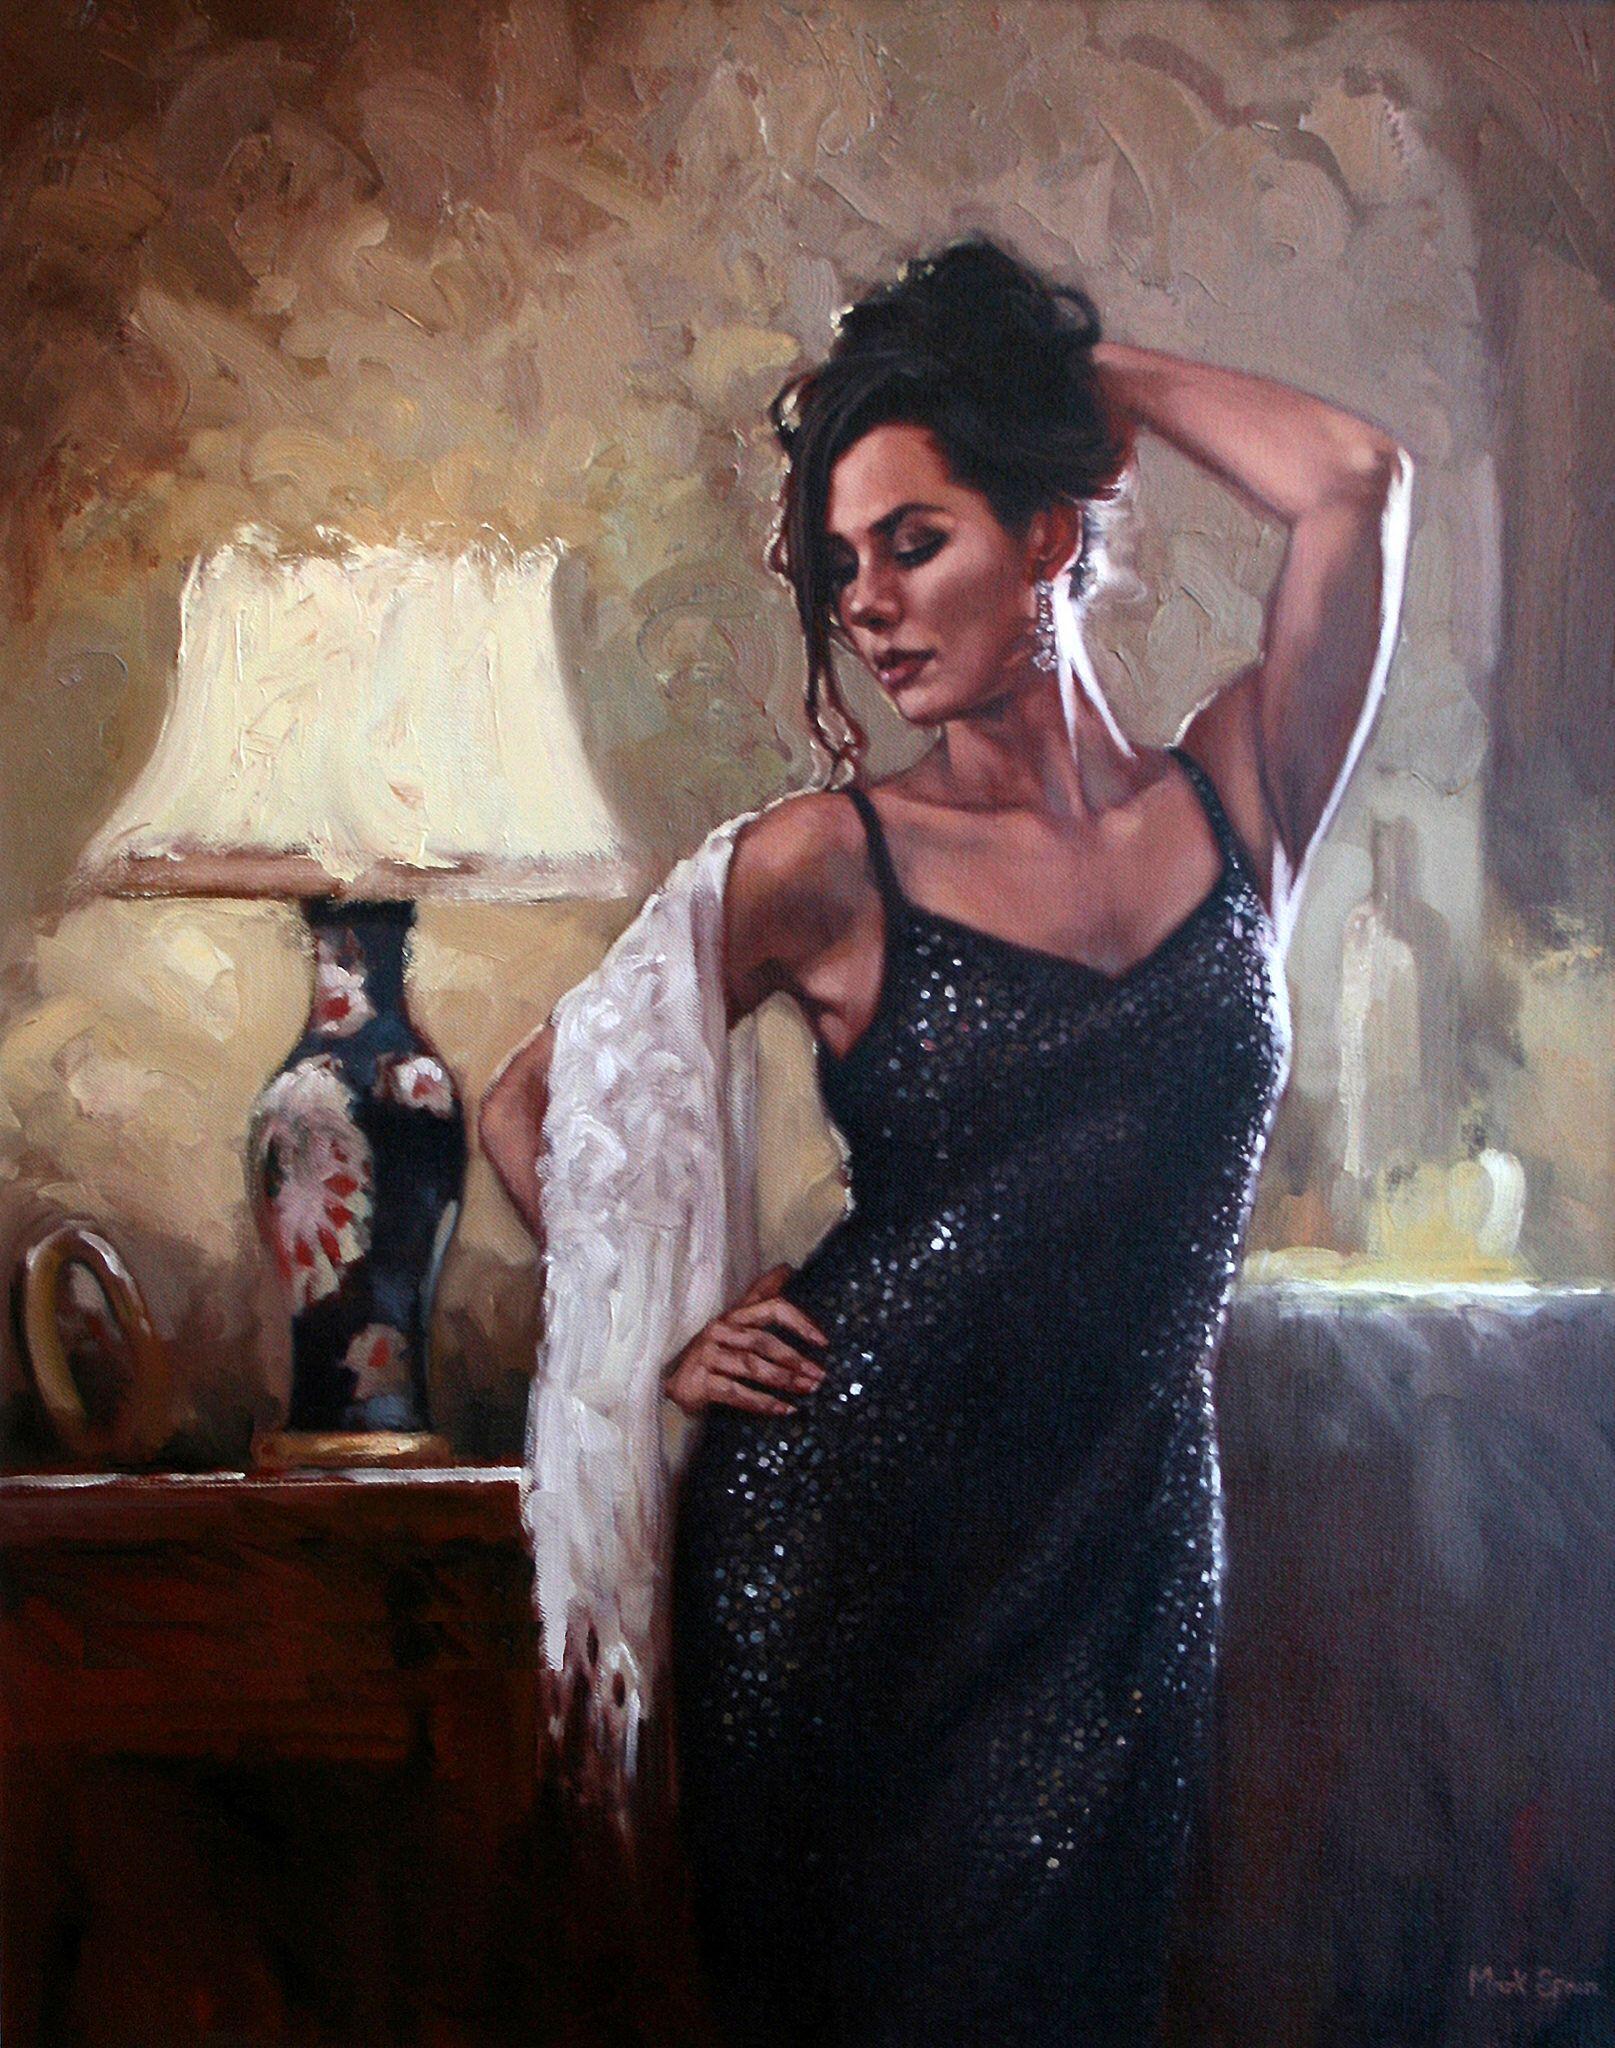 Mark Spain (With images) Art dress, Flamenco dancers